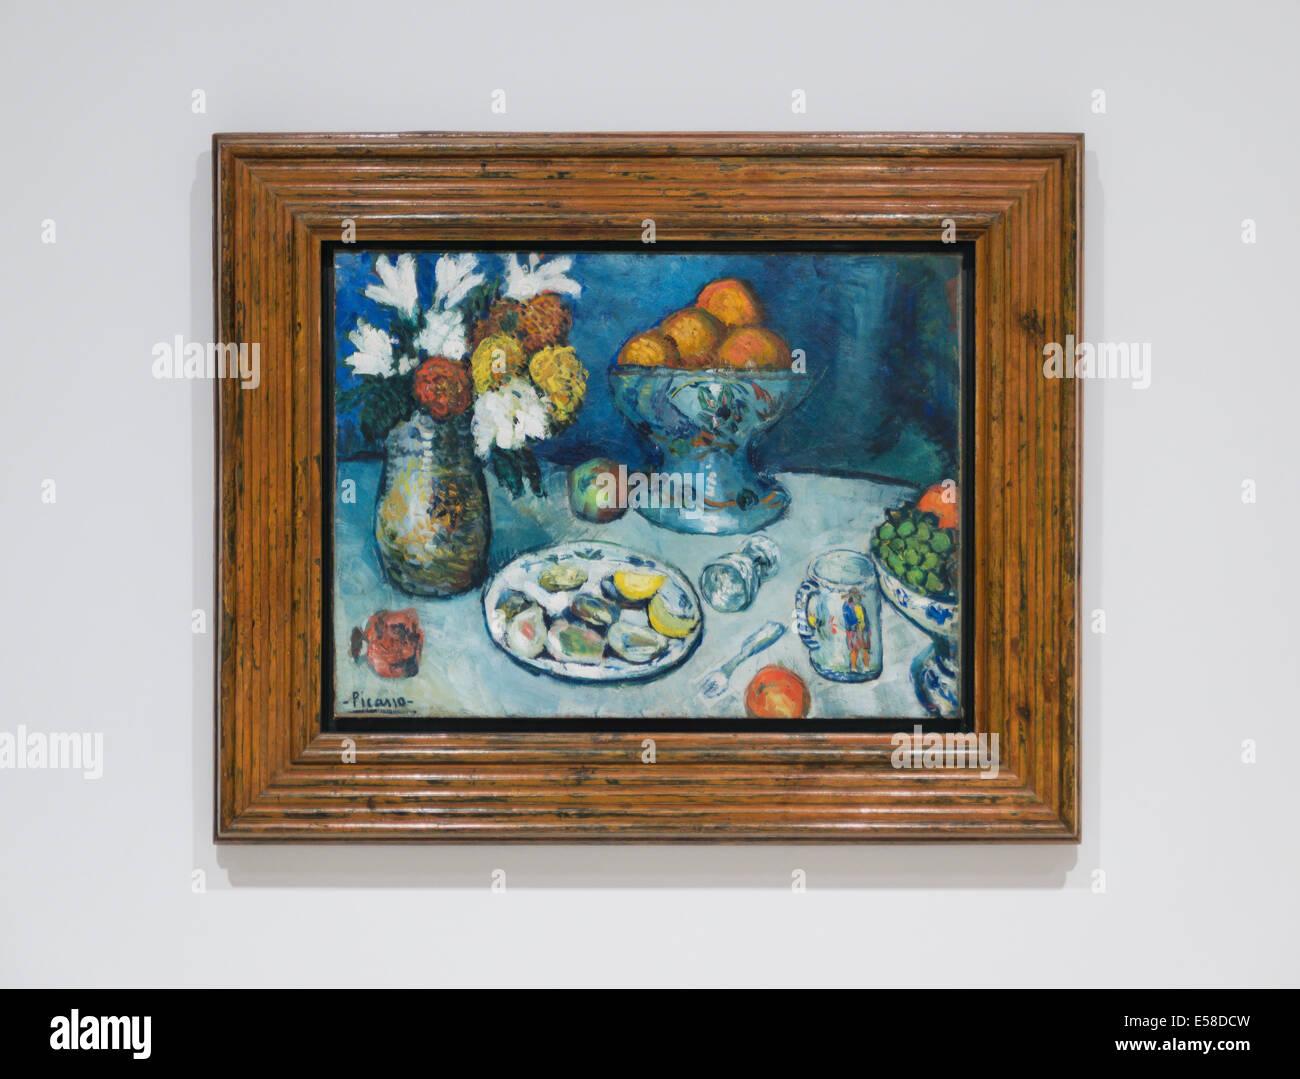 Picasso Bodegón óleo sobre lienzo, en 1901, el Museu Picasso de Barcelona, España. Imagen De Stock